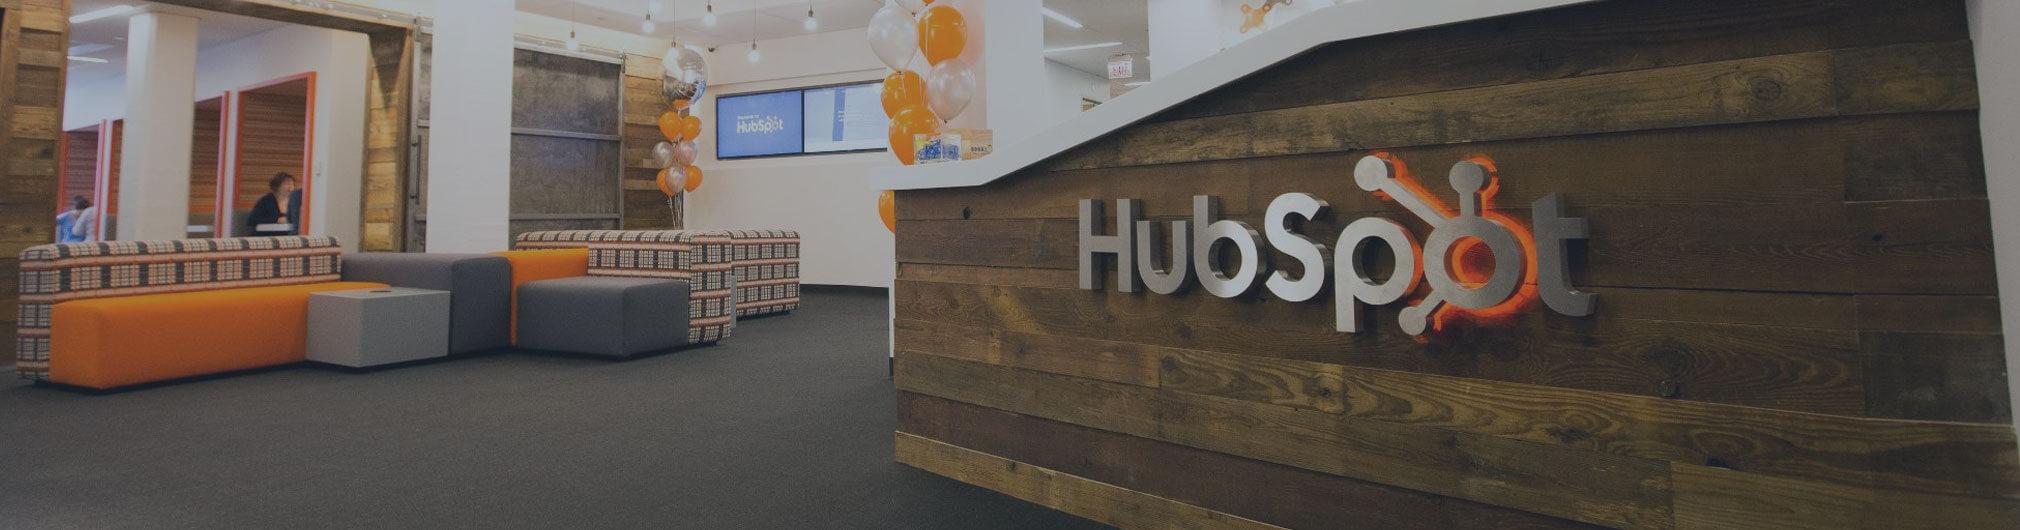 hubspot-office-hero-image-2